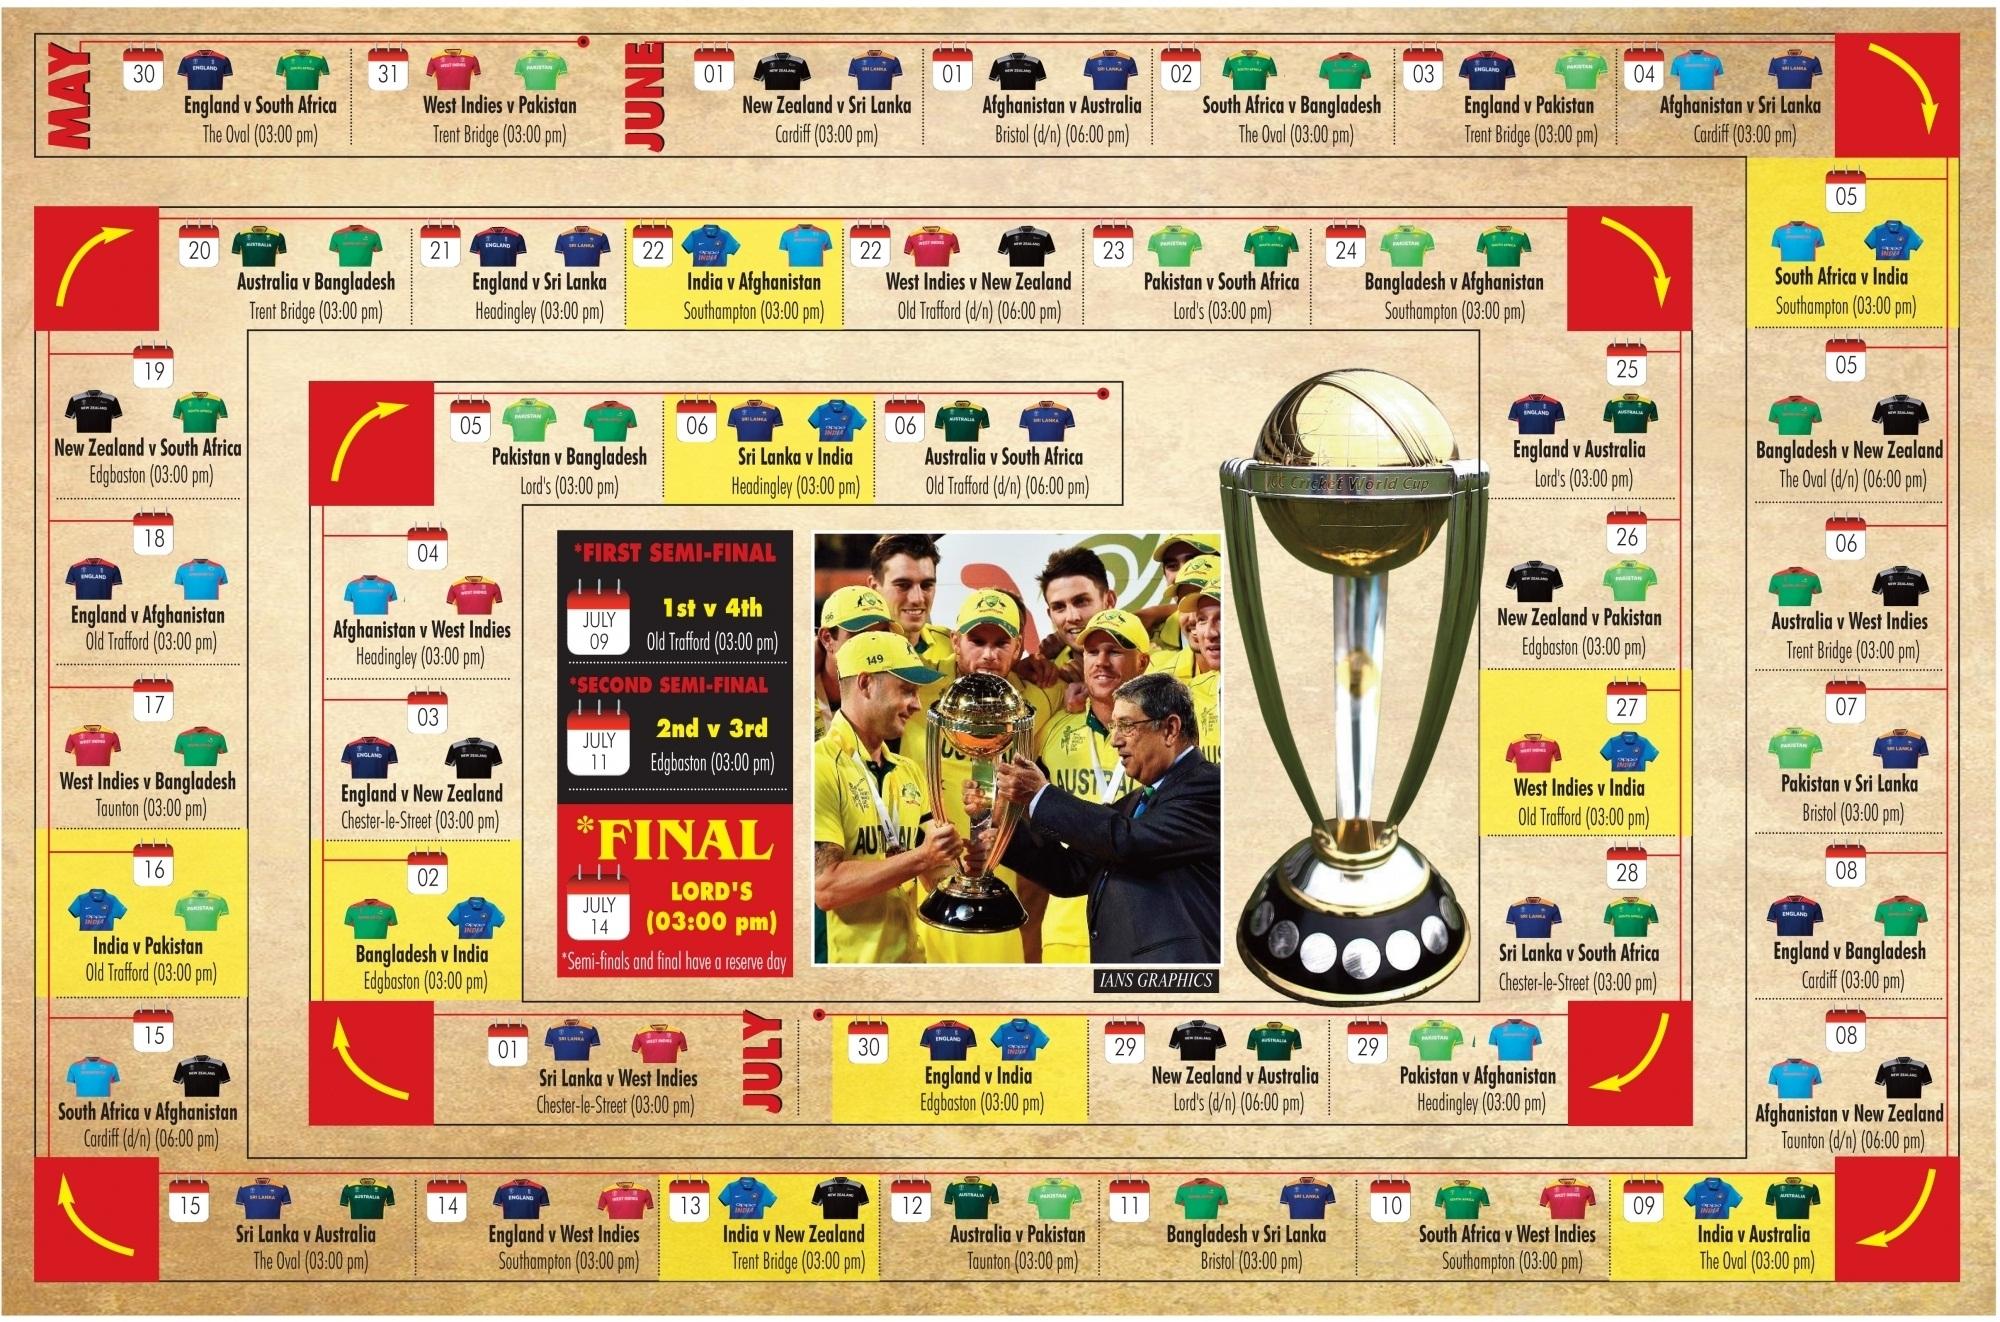 World cup 2019, England, Wales, Buckingham Palace, ICC Cricket, Virat Kohli, India, World Cup opening ceremony, Cricket news, Sports news